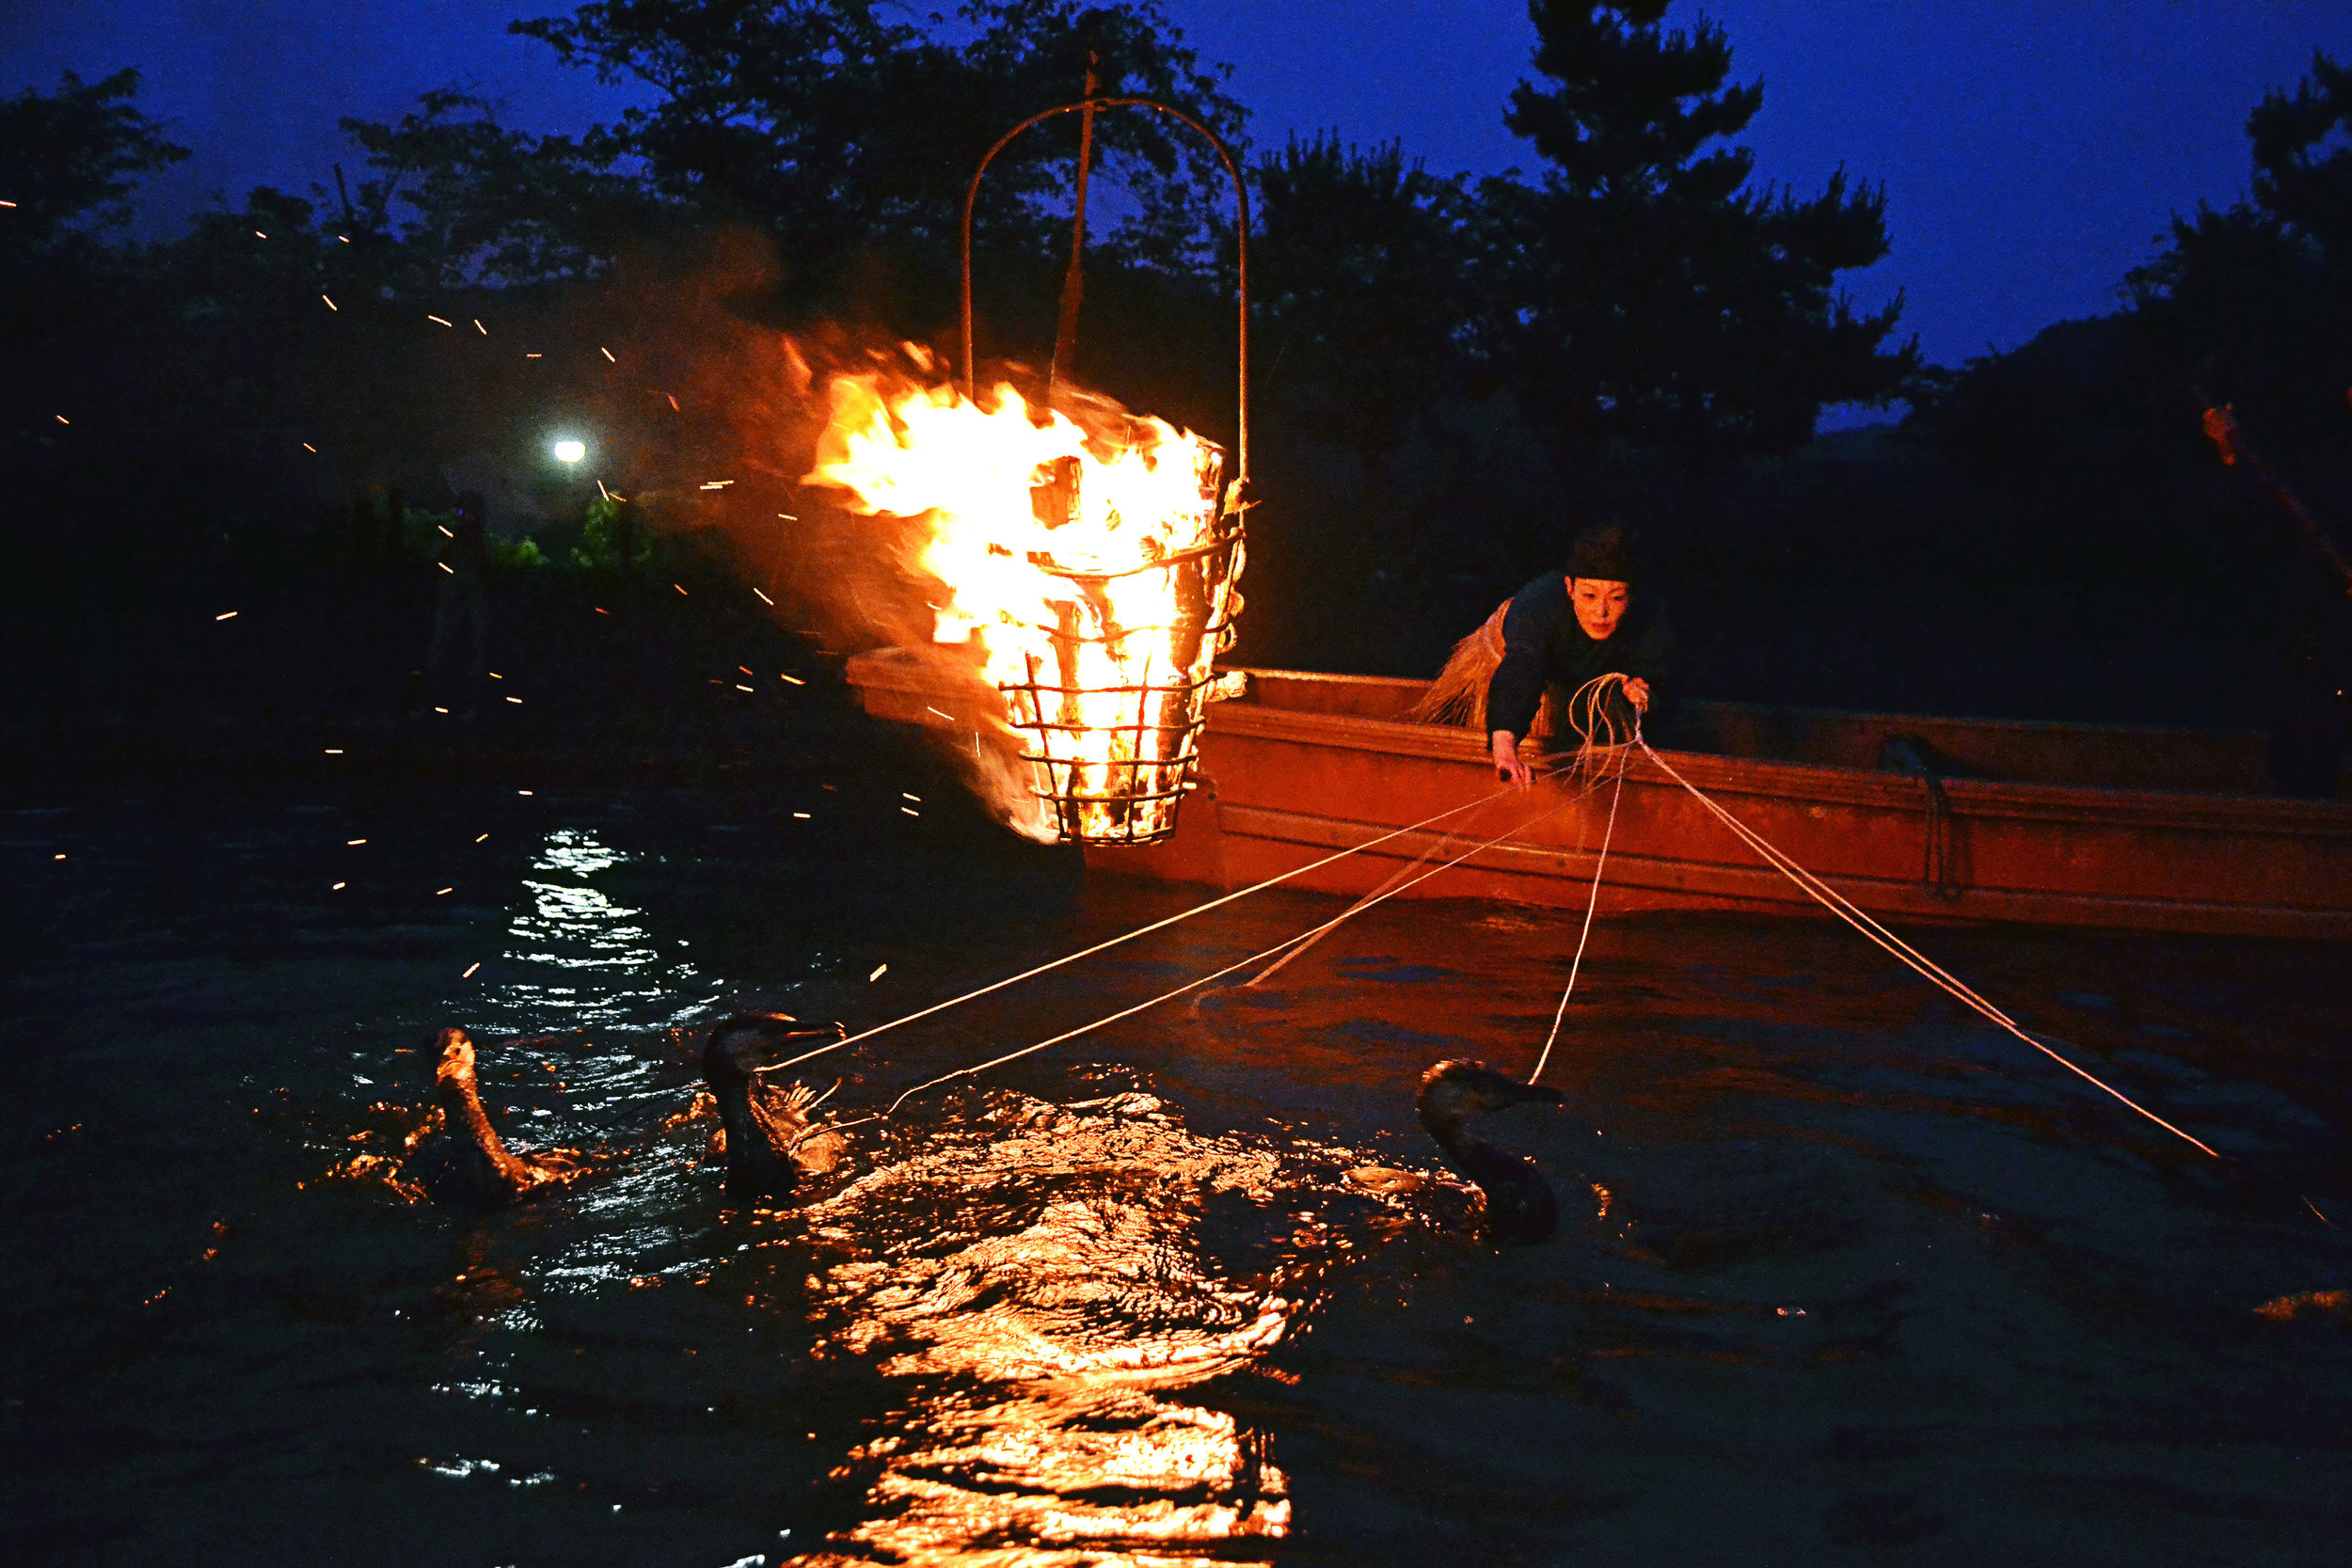 Comorant fishing in Uji, Kyoto